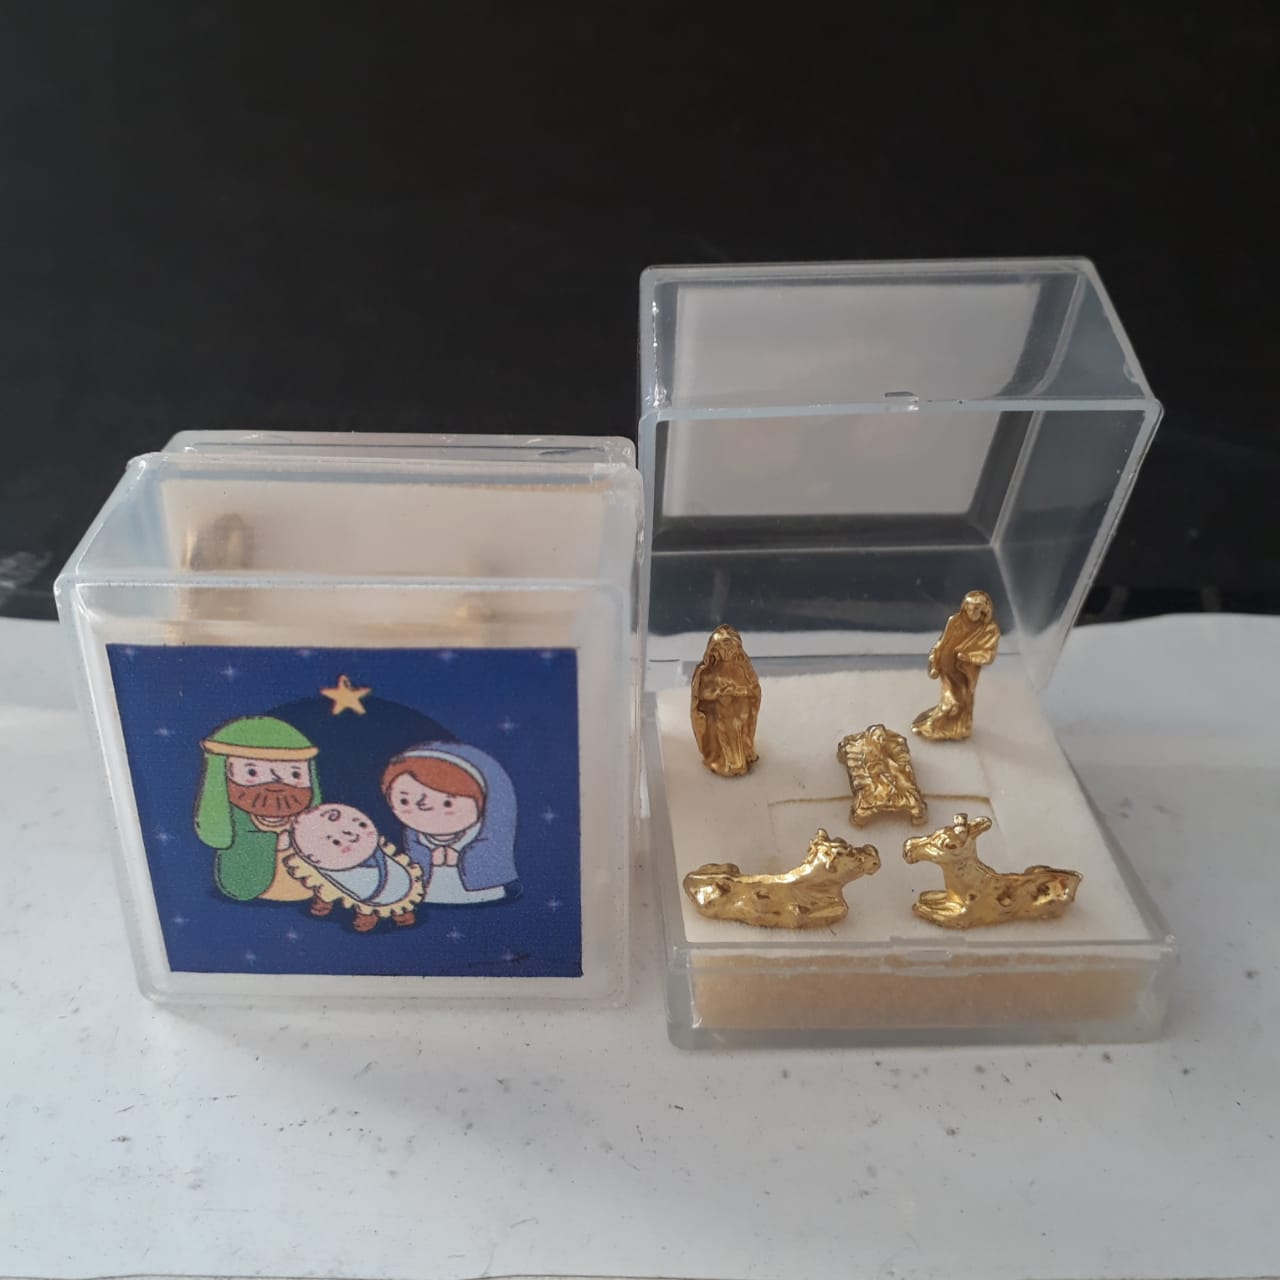 IN200 - Presepio Caixa Acrilico Cristal 4mm  - VindVedShop - Distribuidora Catolica